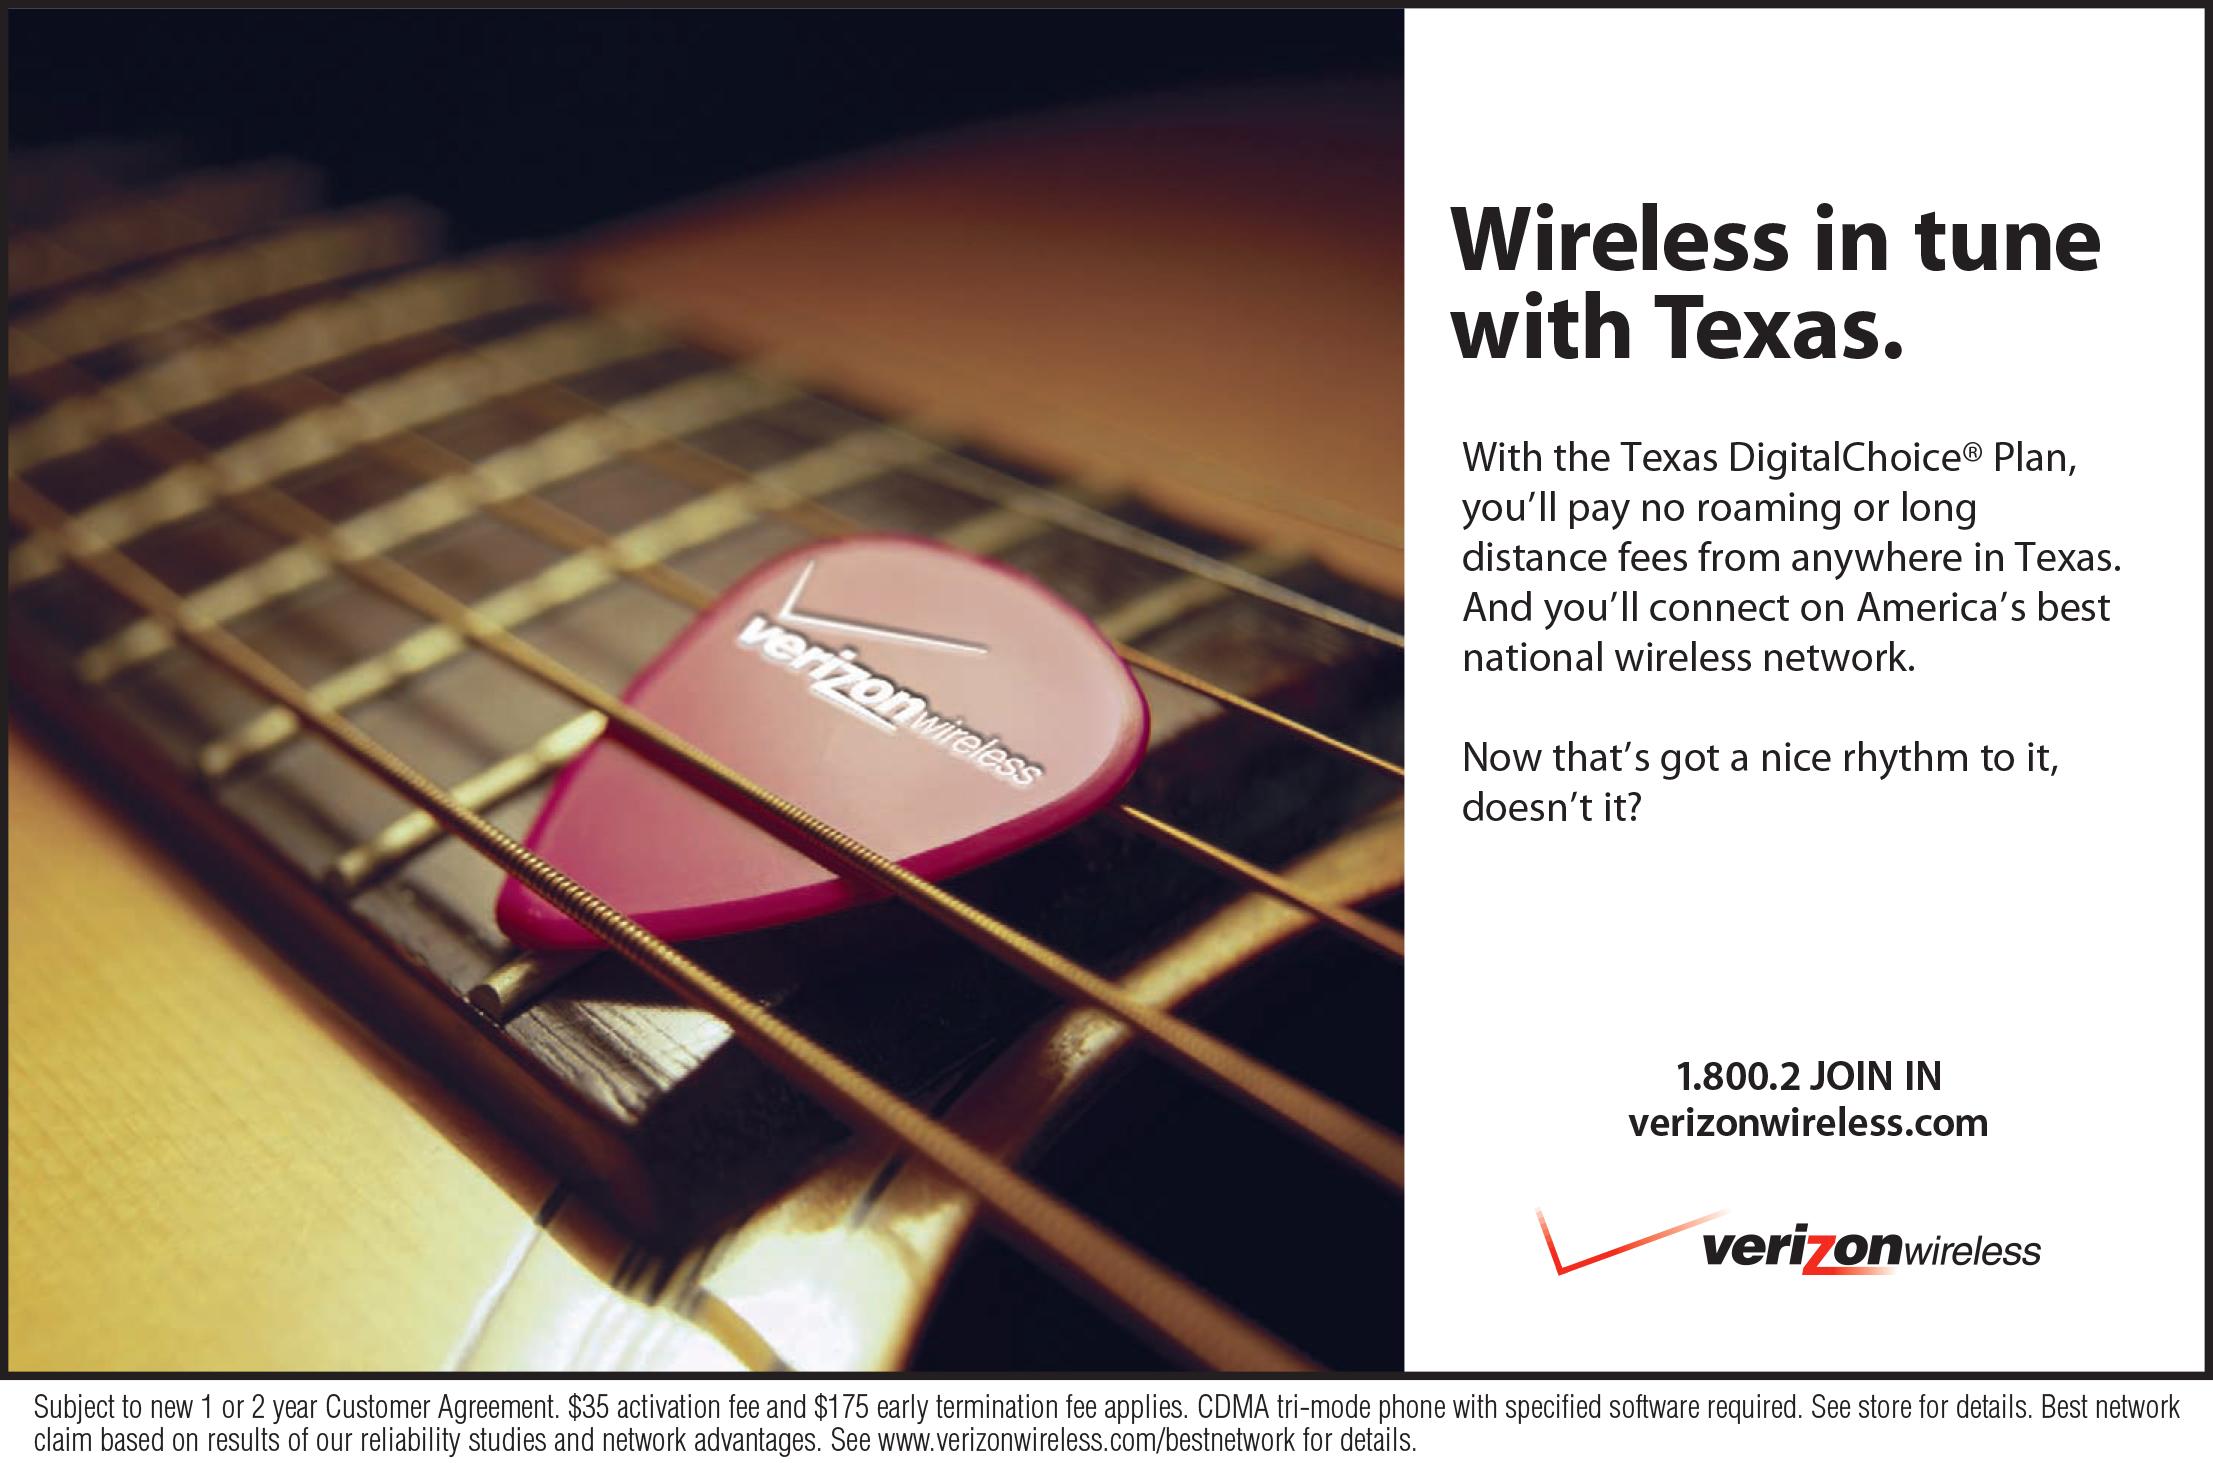 Verizon Wireless Texas Region Ad